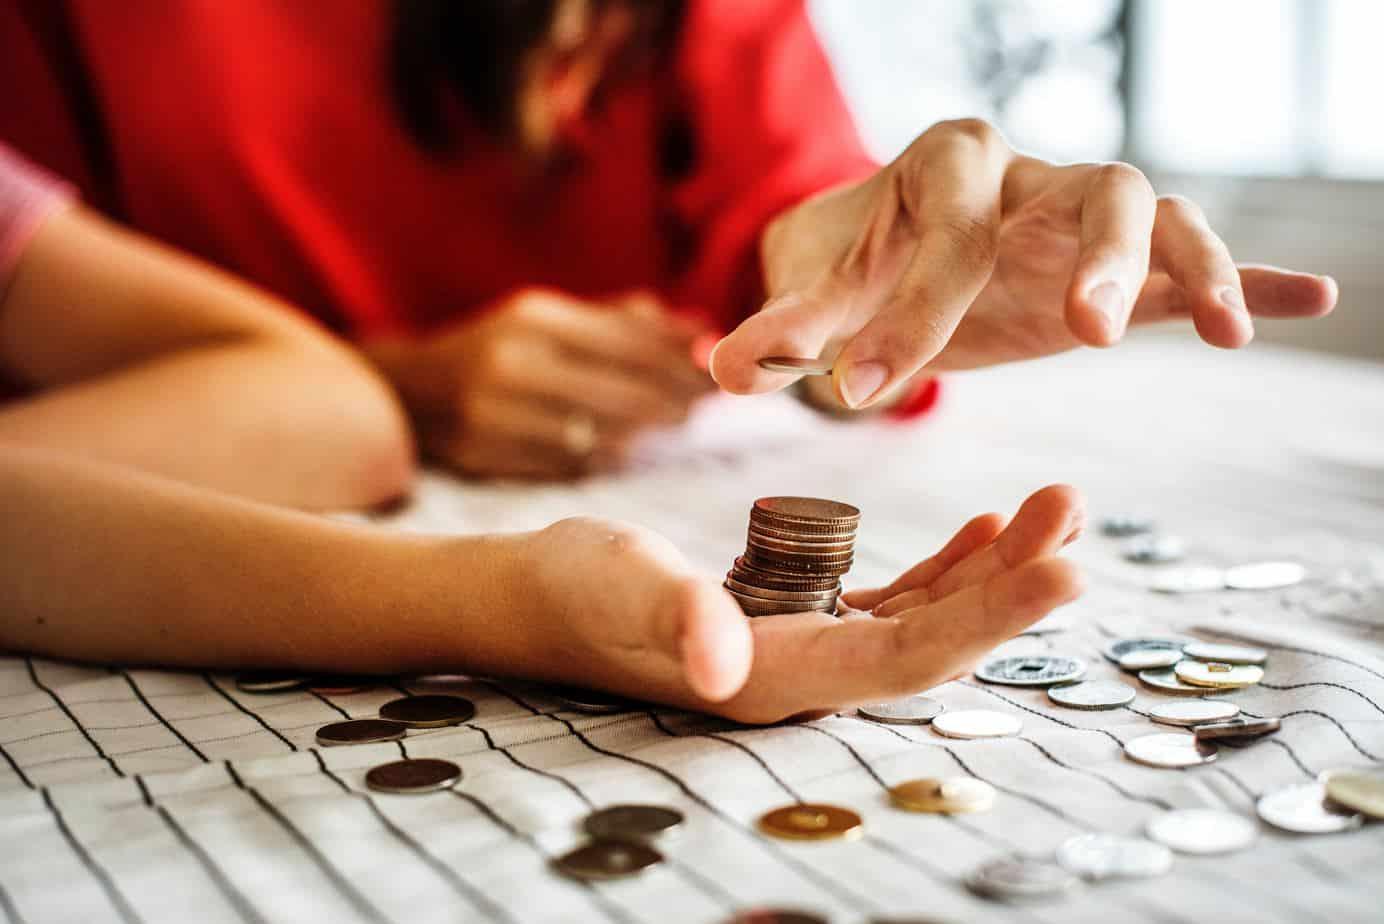 Smarter Ways To Save A Little Money On A Regular Basis